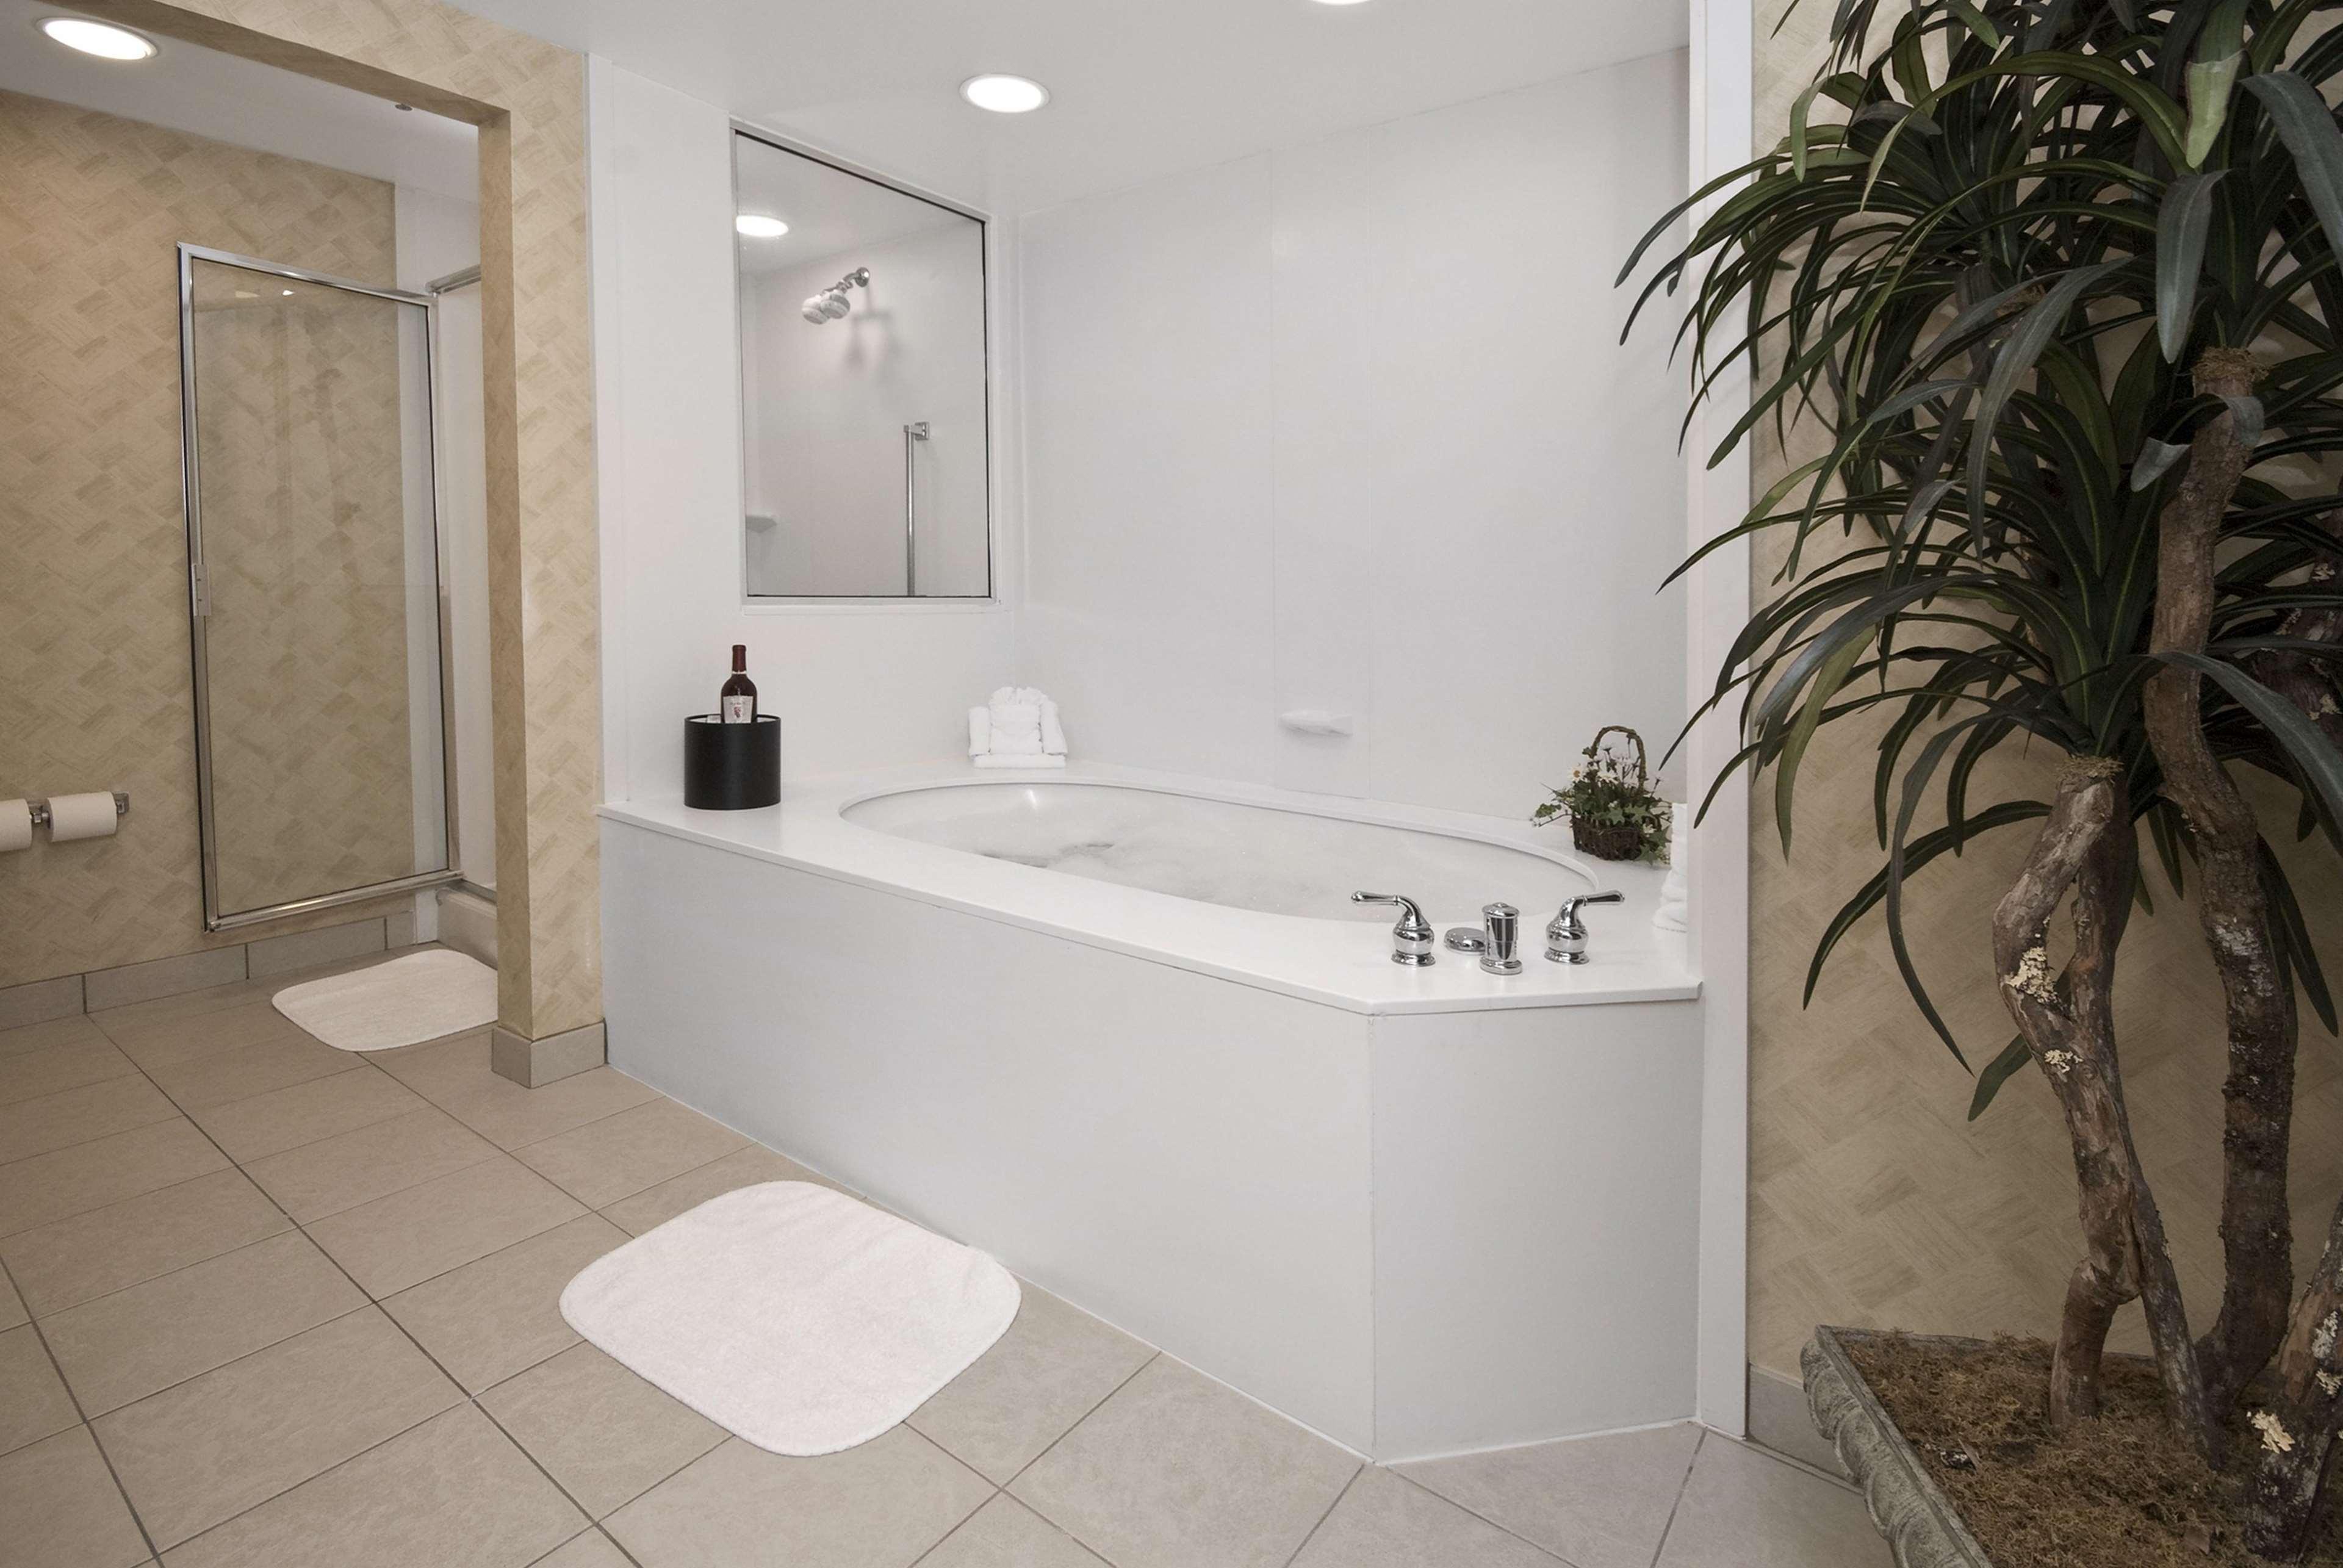 Hampton Inn & Suites Jacksonville South-St. Johns Town Center Area image 32